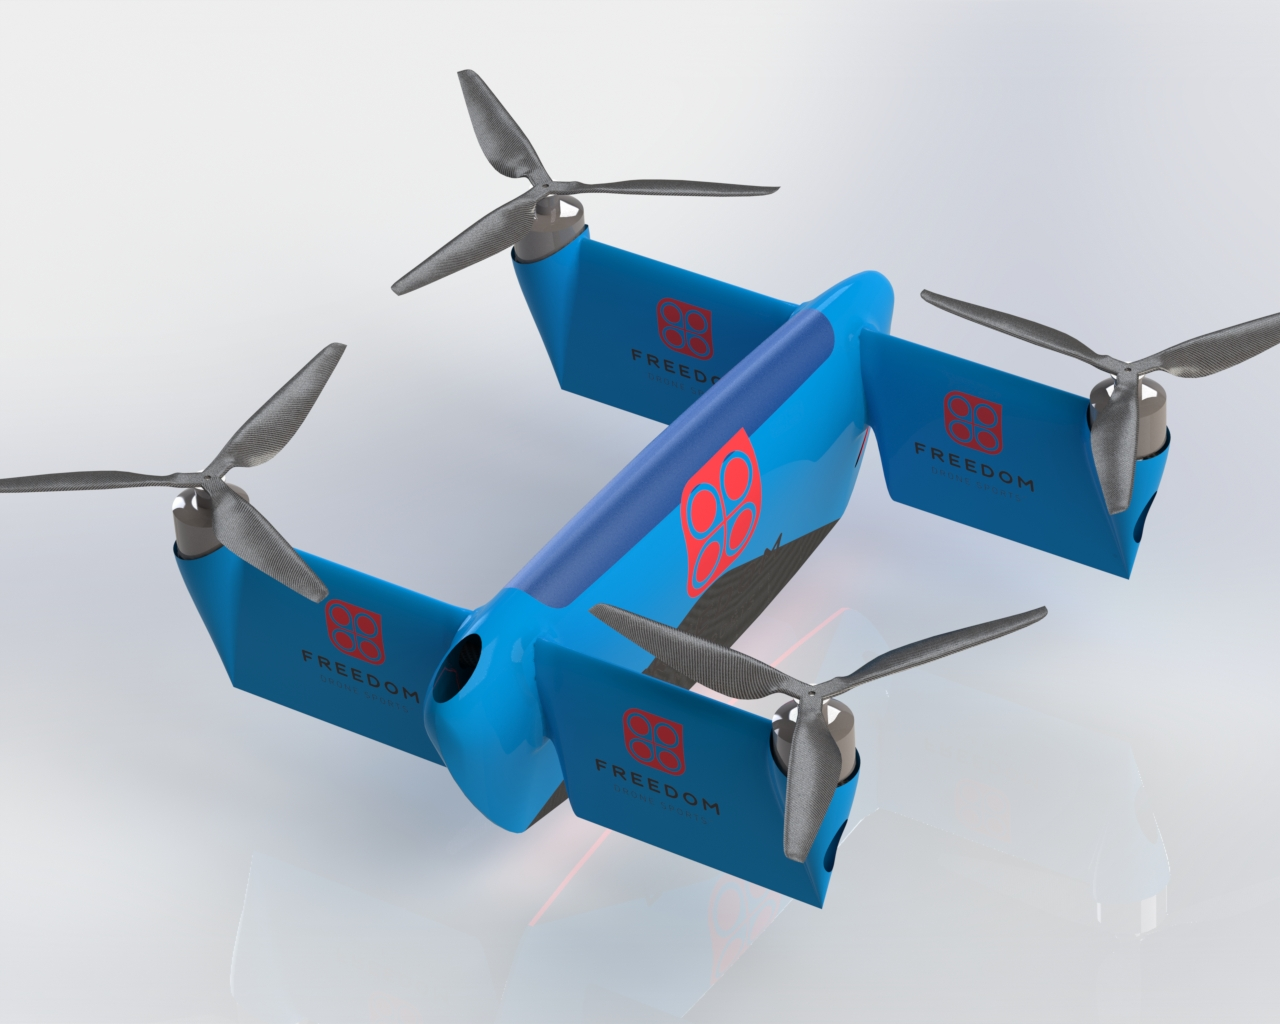 freedom class racing drone giant